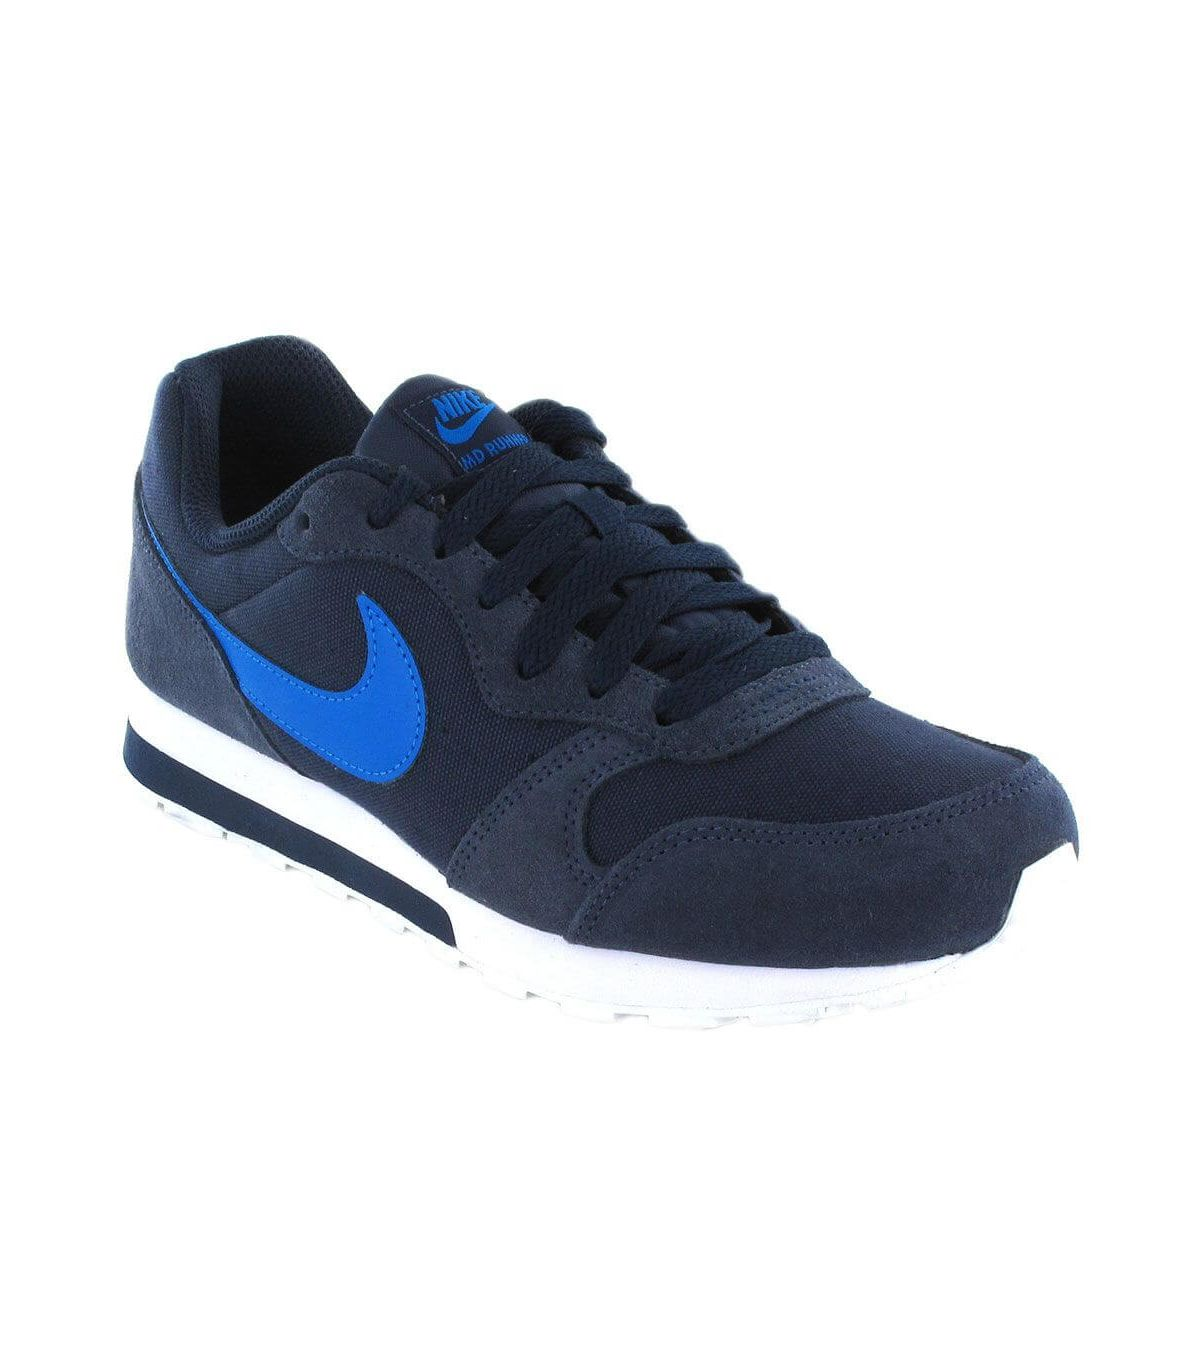 Nike MD Runner 2 GS 410 Nike Calzado Casual Junior Lifestyle Tallas: 38,5; Color: azul marino